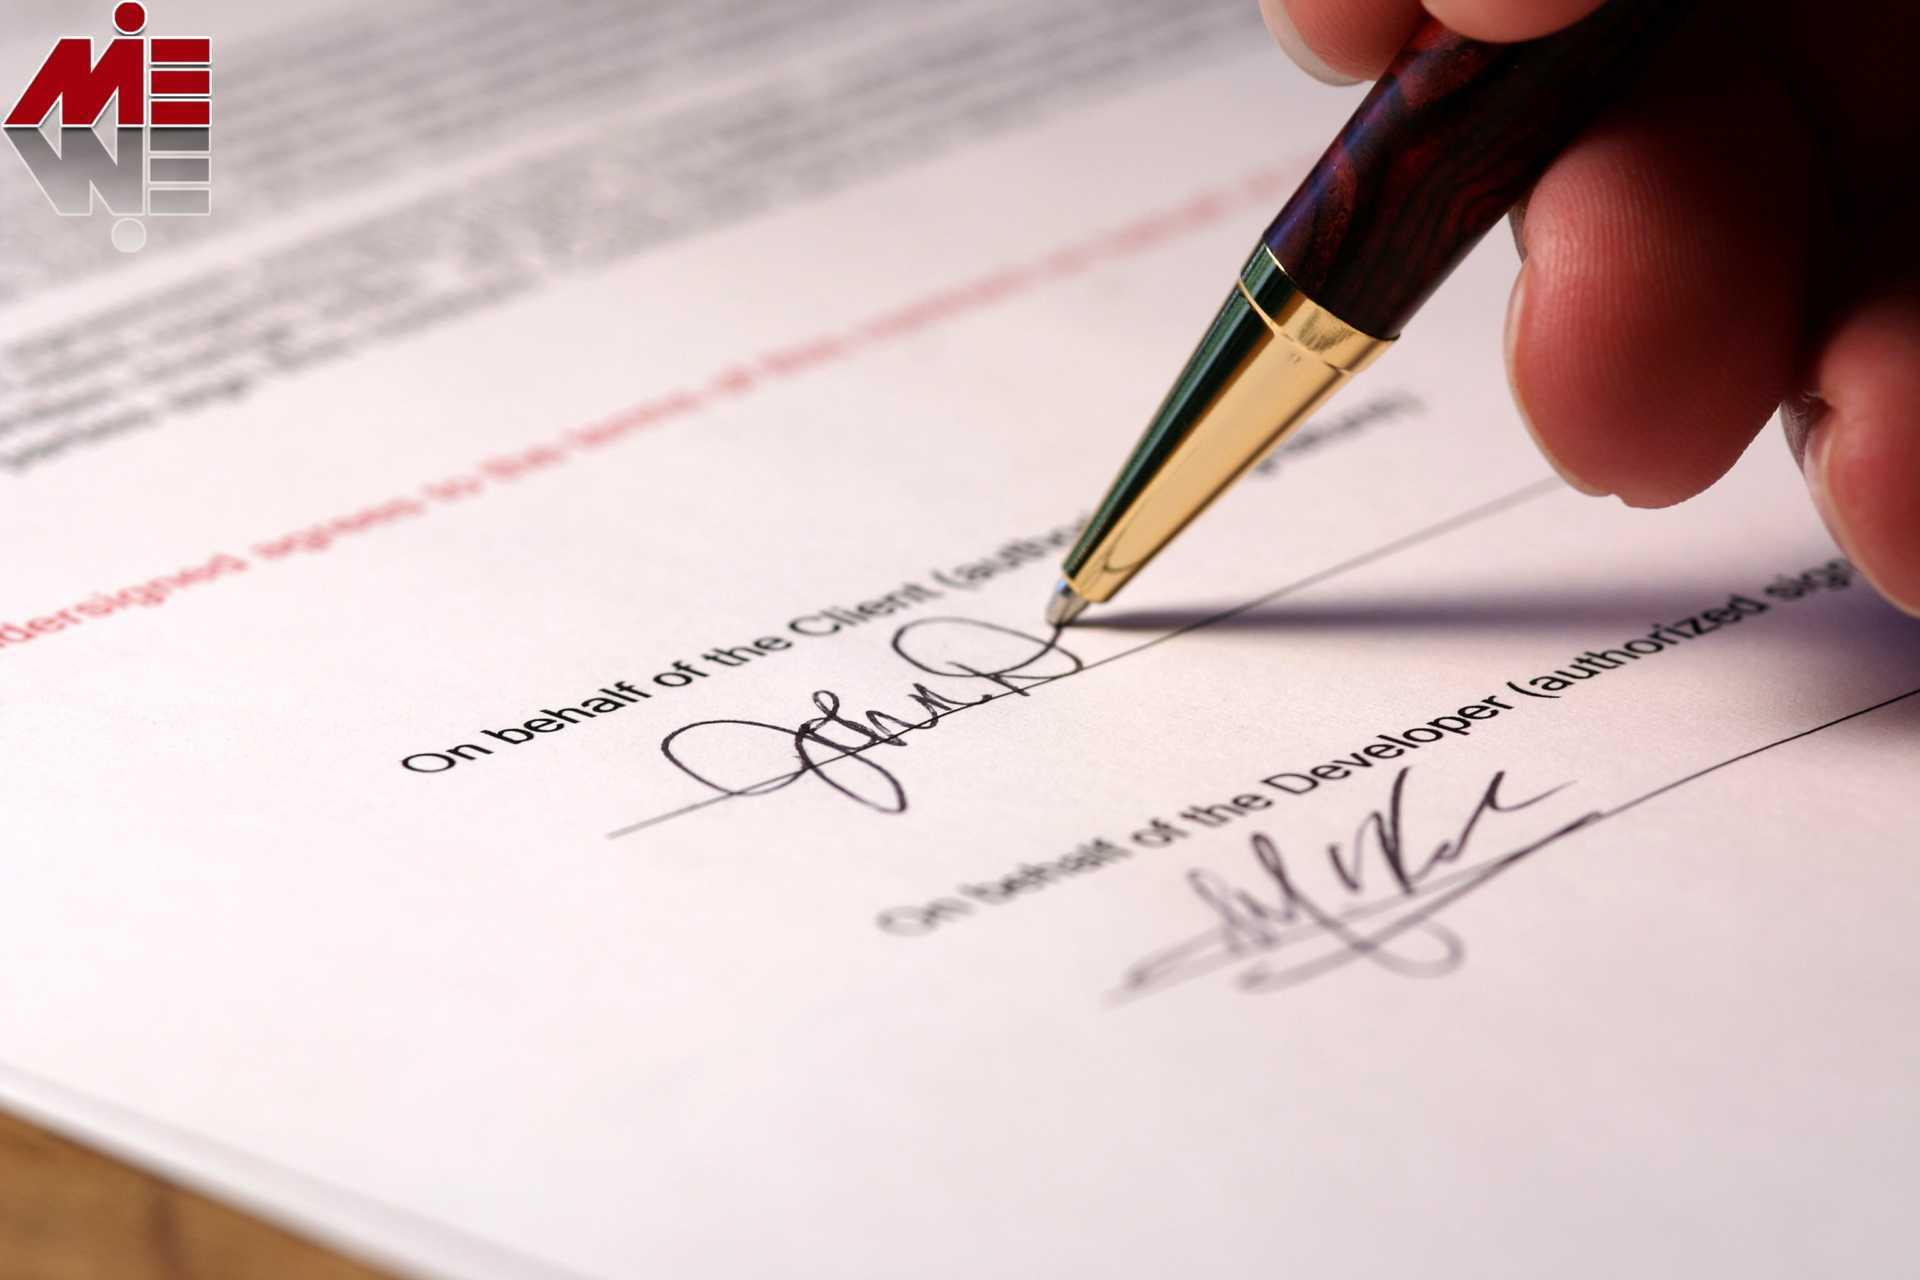 Signing contract document signature موسسه مهاجرتی در مازندران